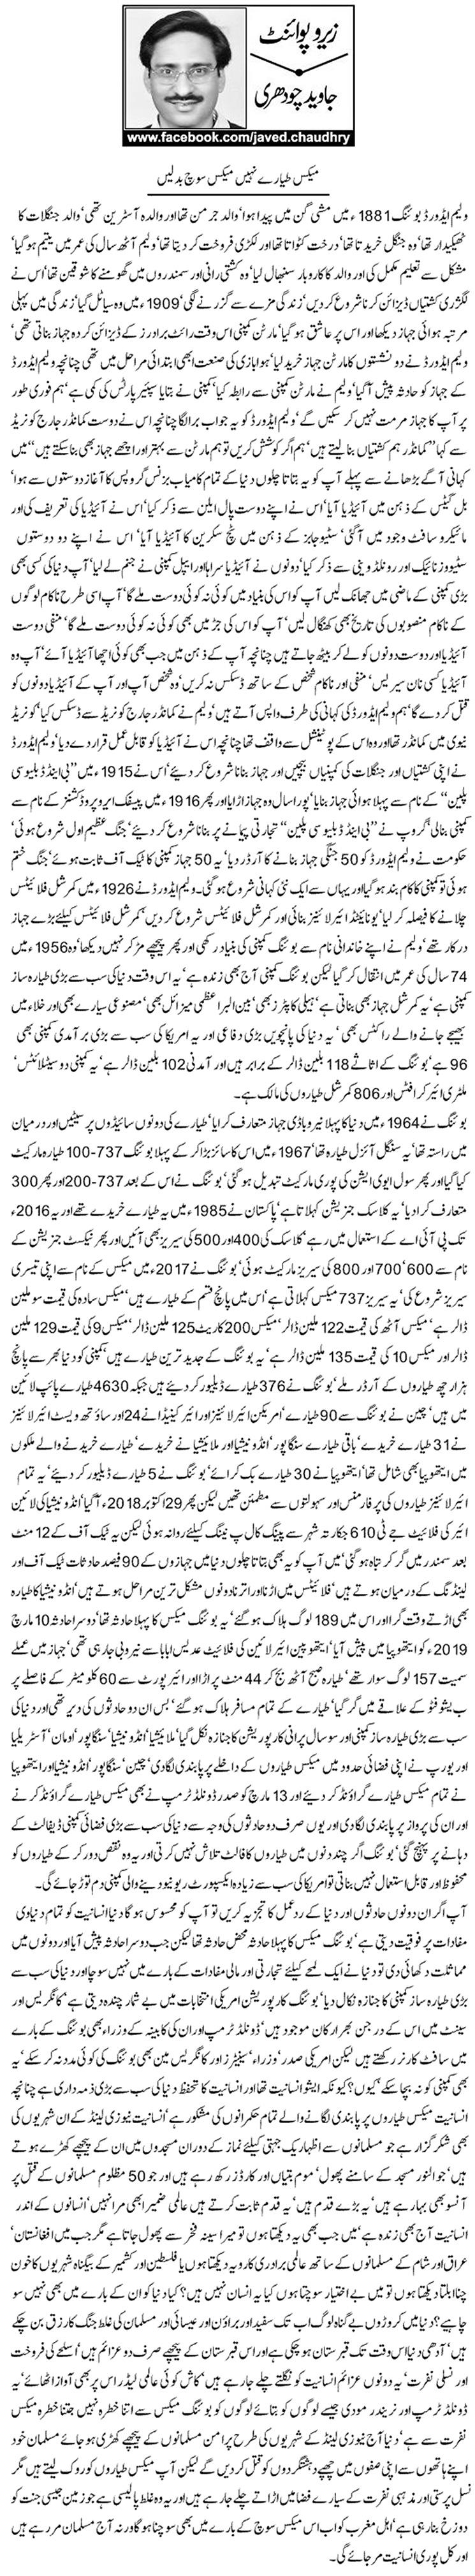 Javed Chaudhry